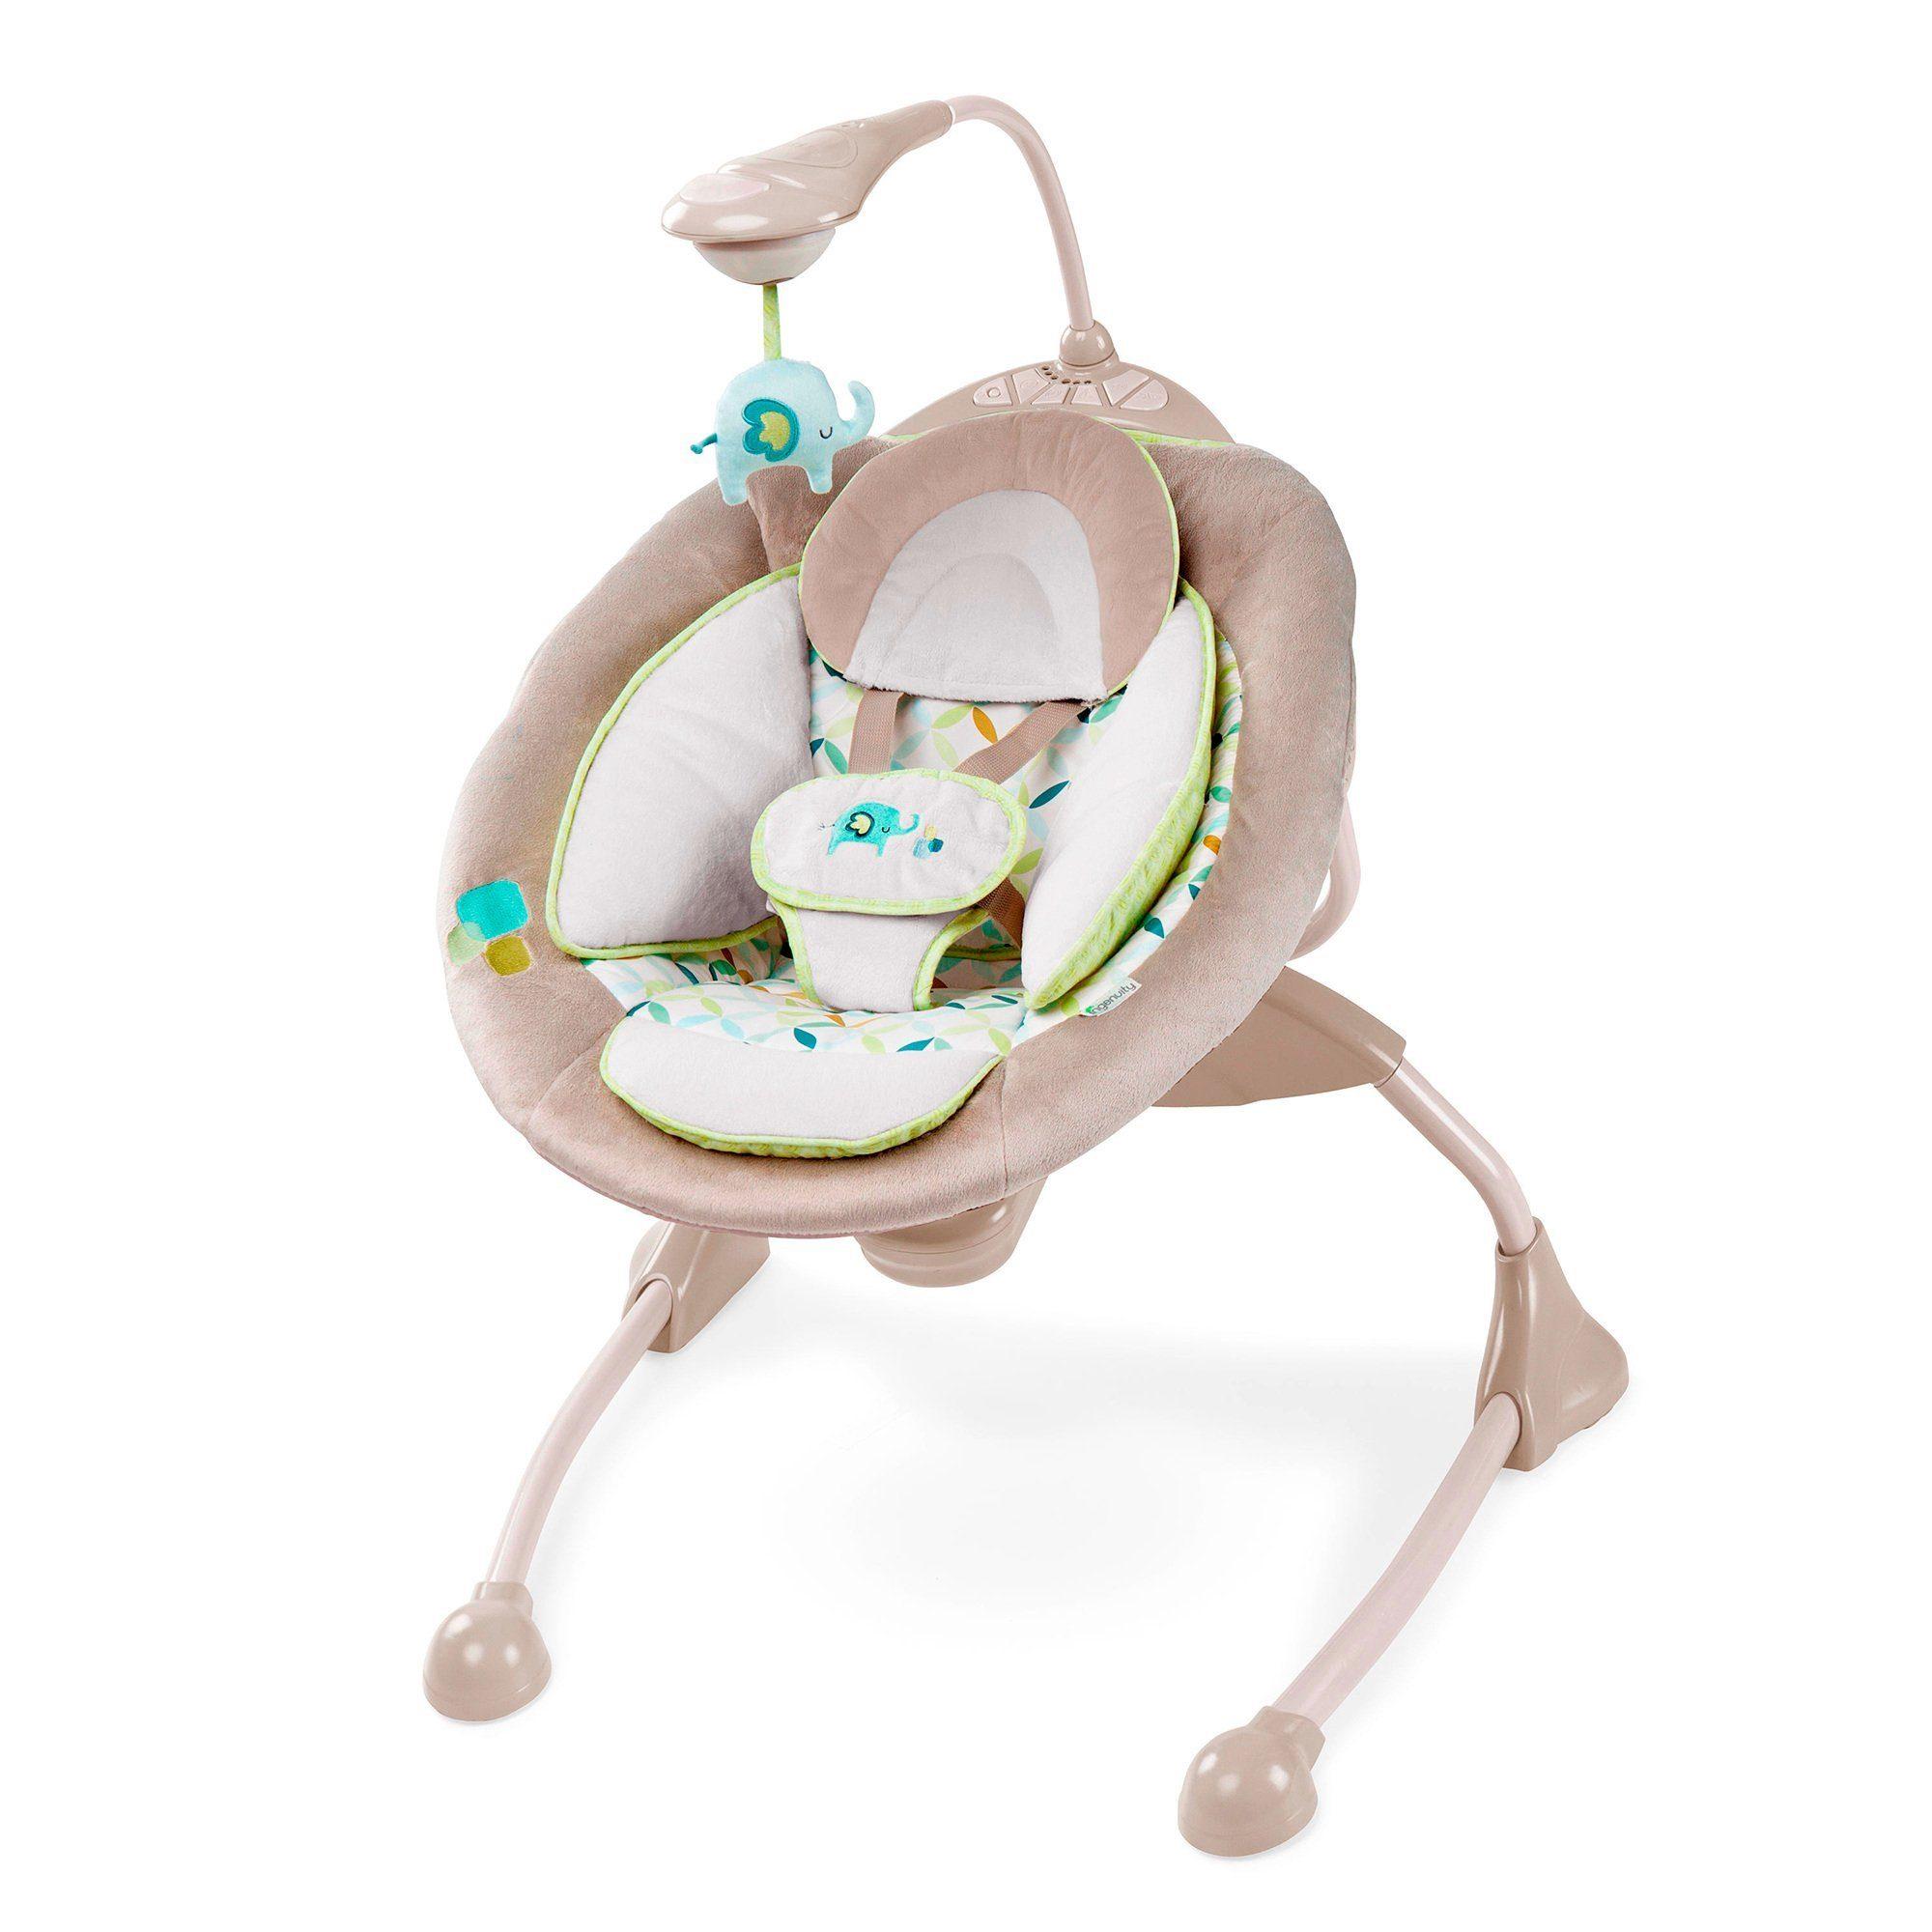 INGENUITY Babywippe InLighten Sway Seat™